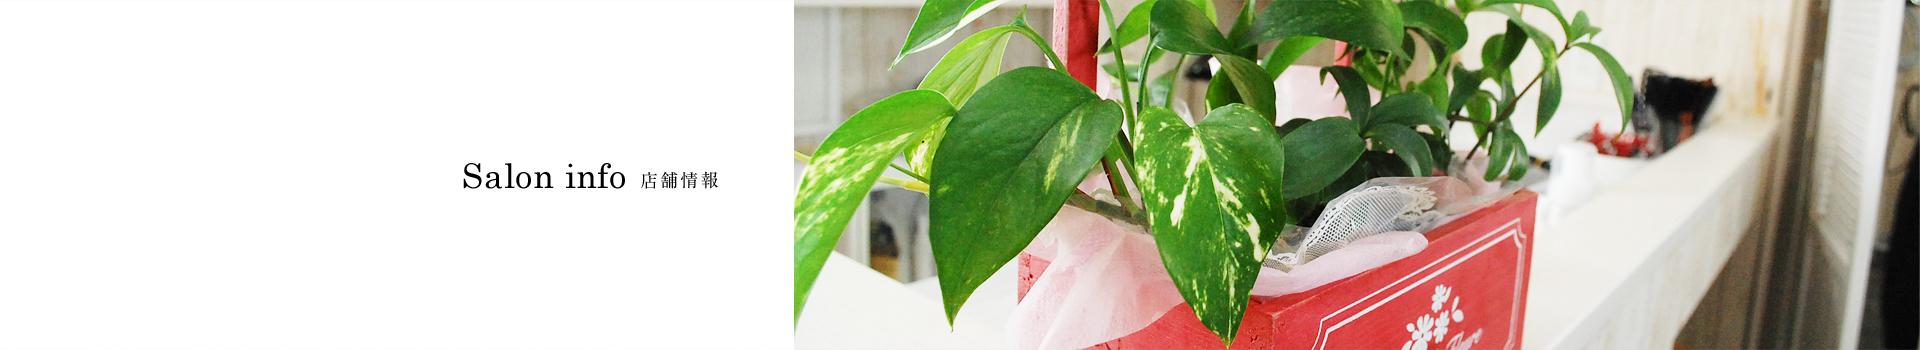 Salon info | 兵庫県丹波市で美容院・ヘアーサロンは落ち着いたカフェ風のailes(エール)